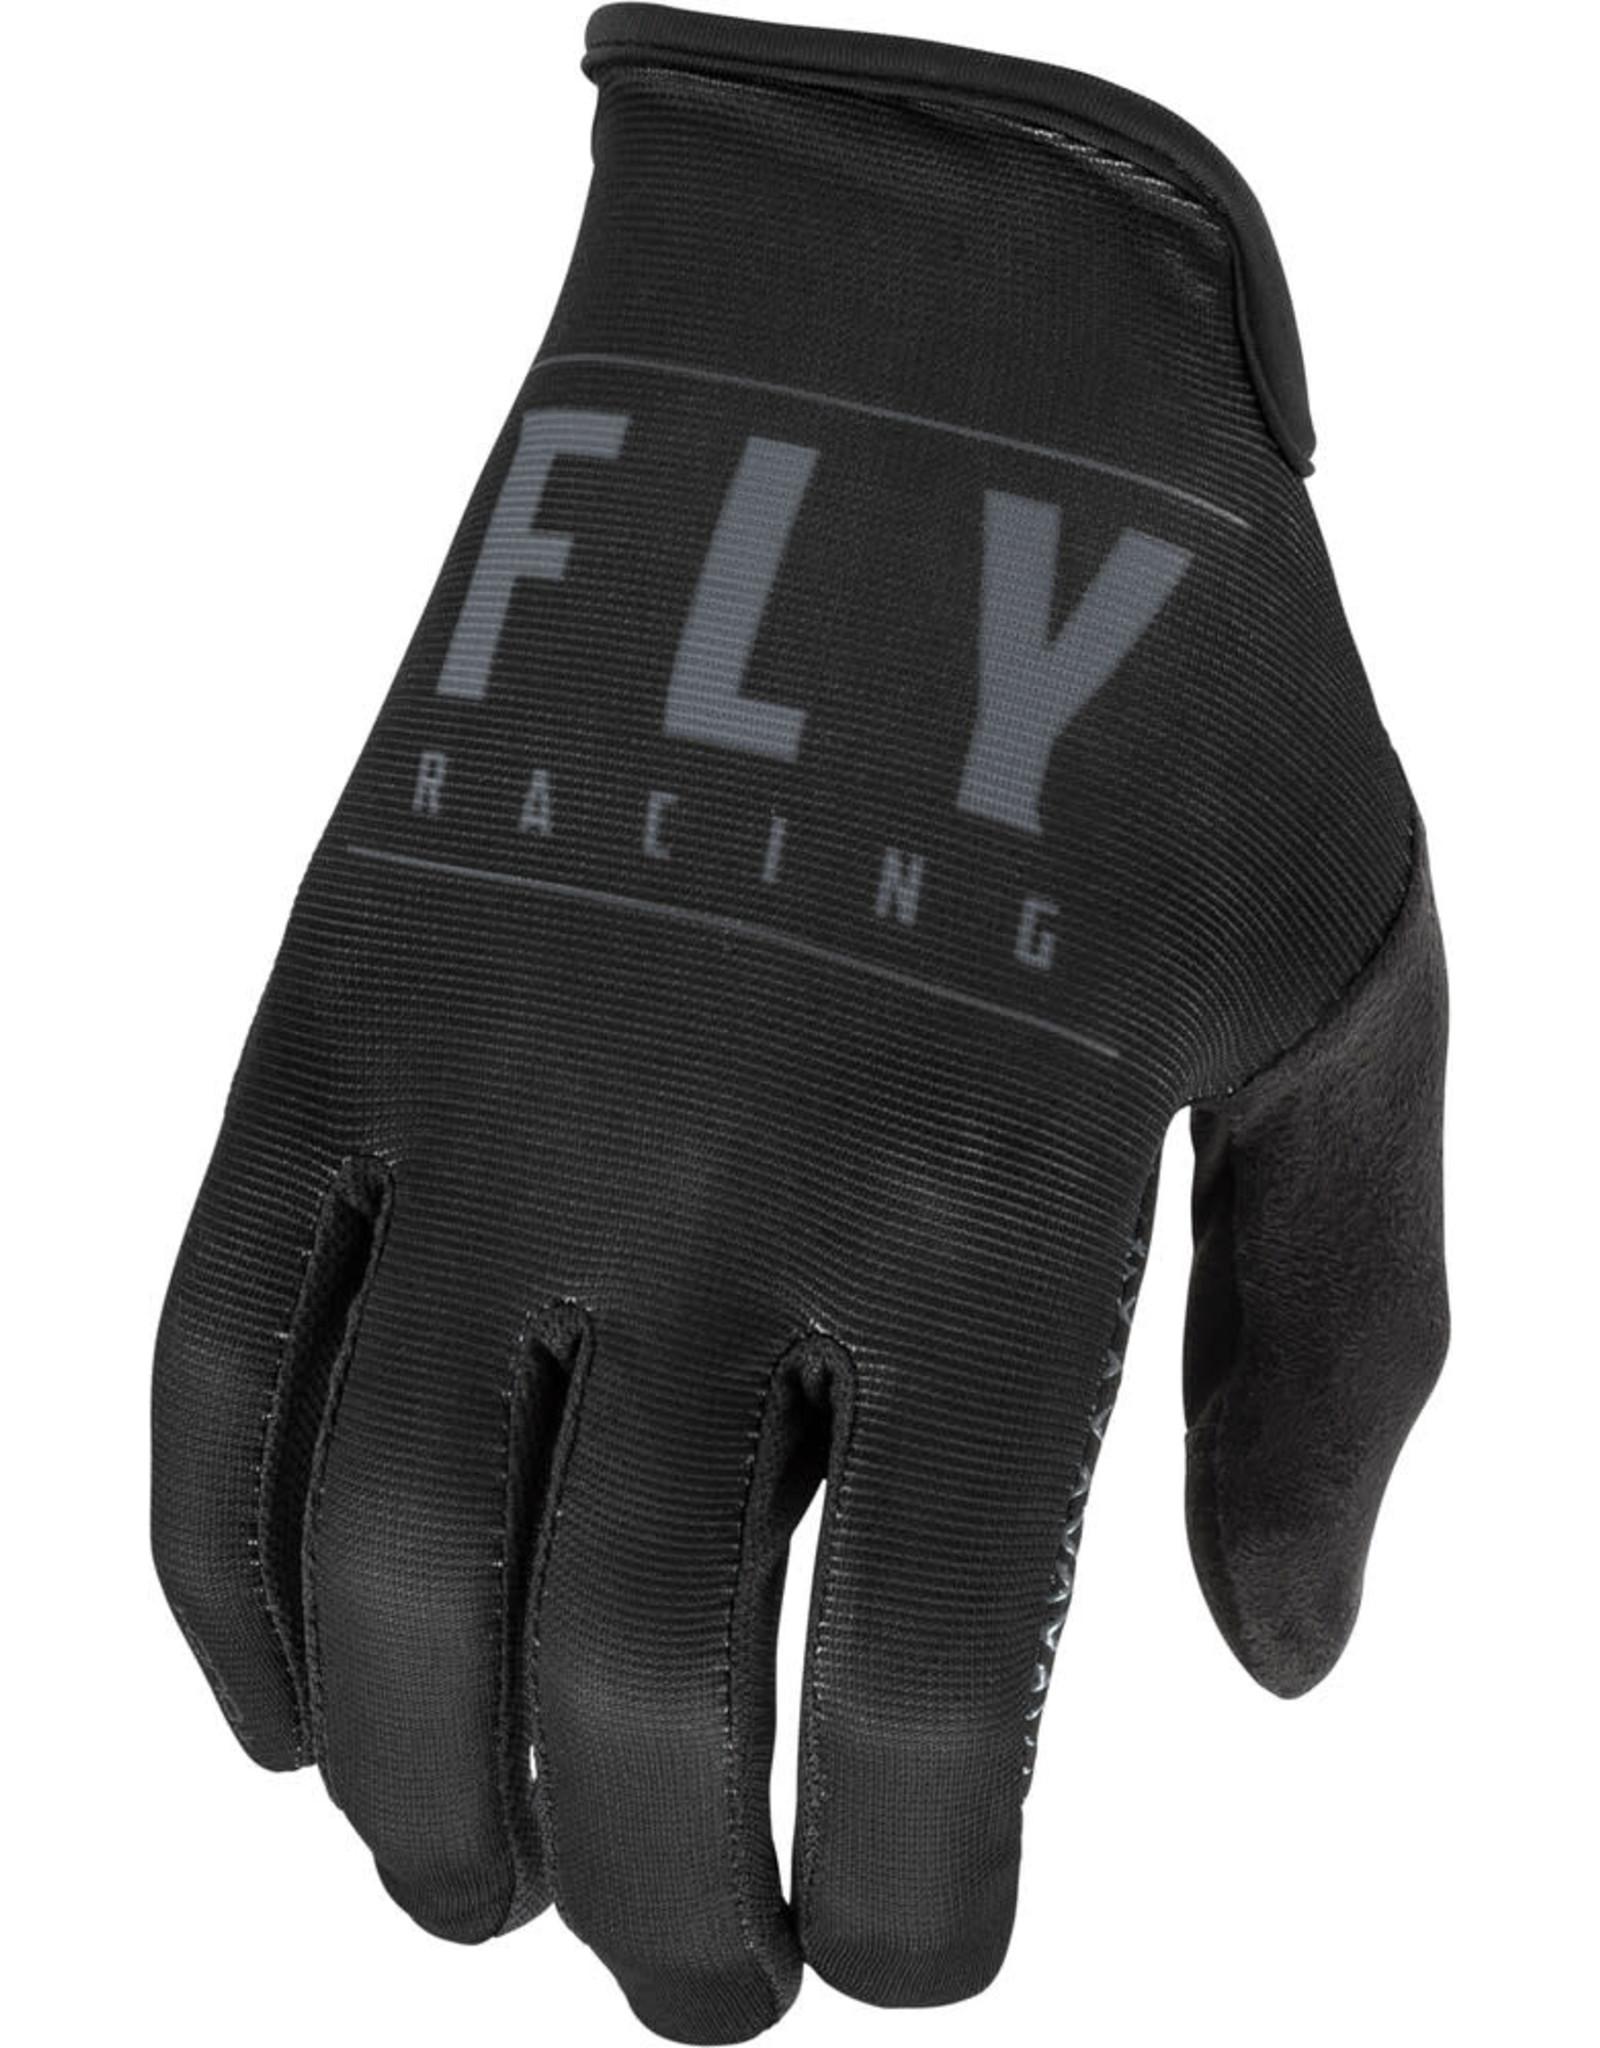 FLY RACING 2021 FLY Racing Media Gloves Black/Black